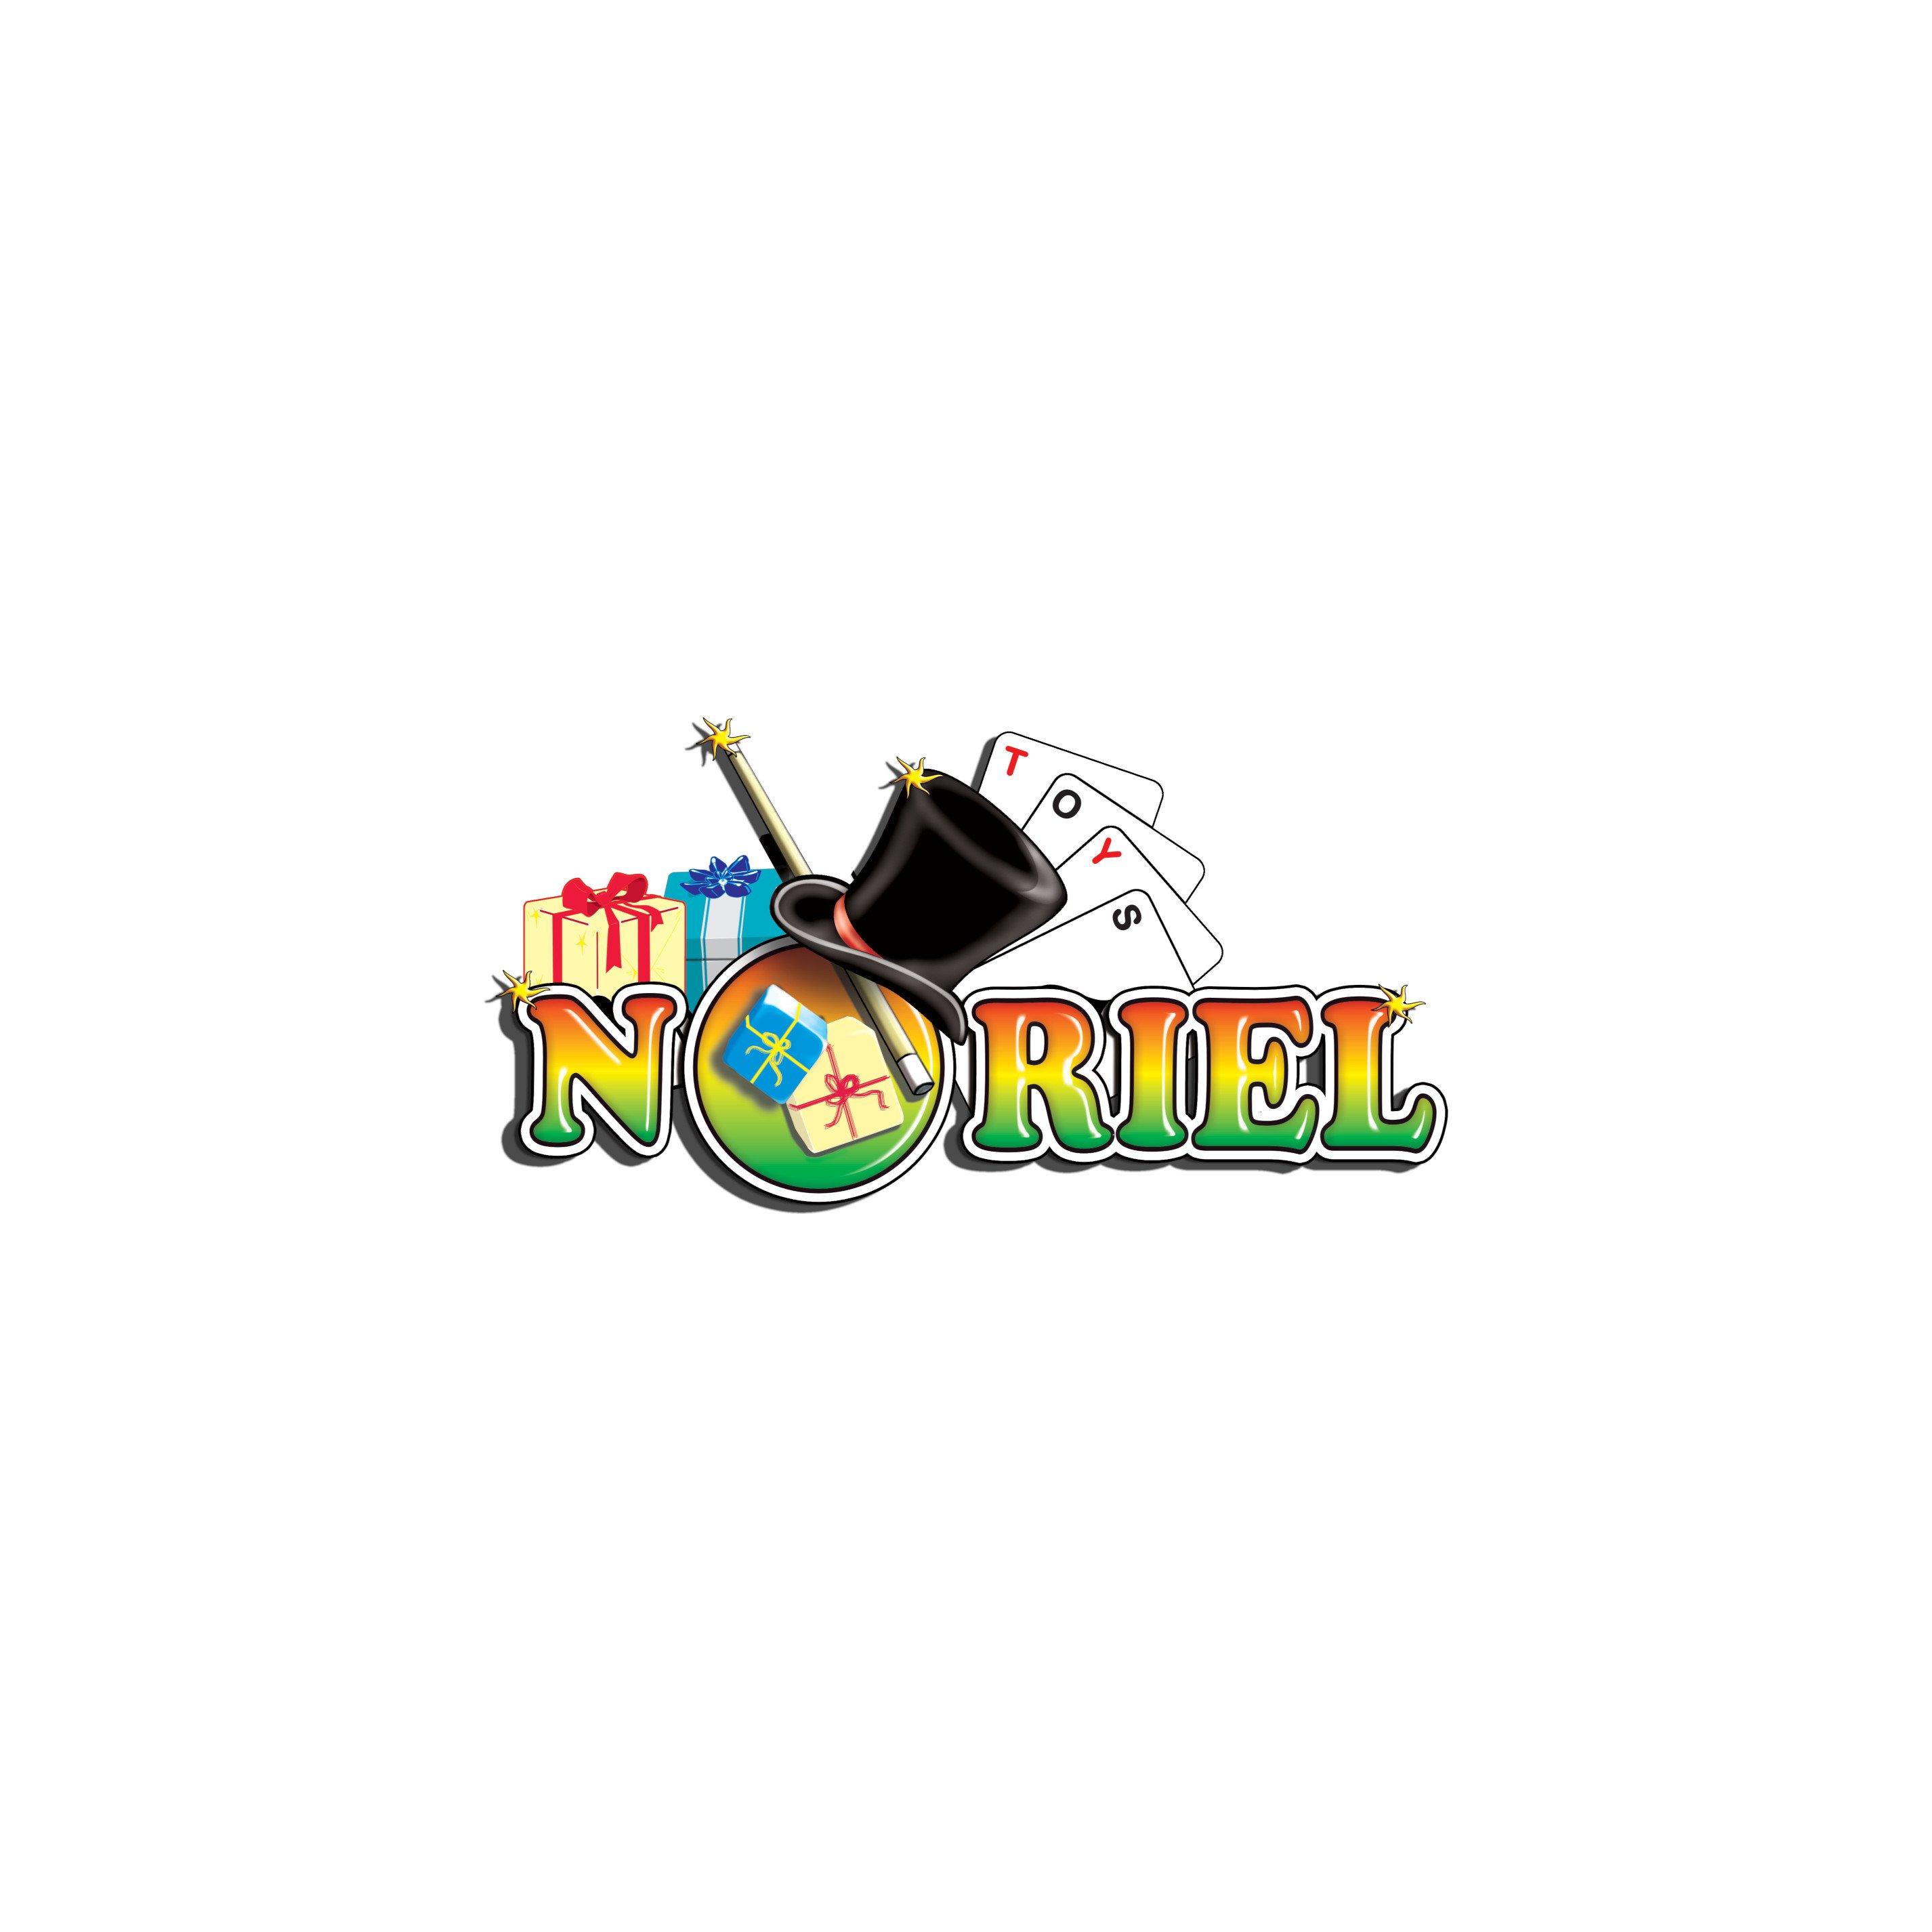 TGET-016C1E_001w Penar neechipar cu o capa Herlitz Earnest, Rainbow Horse